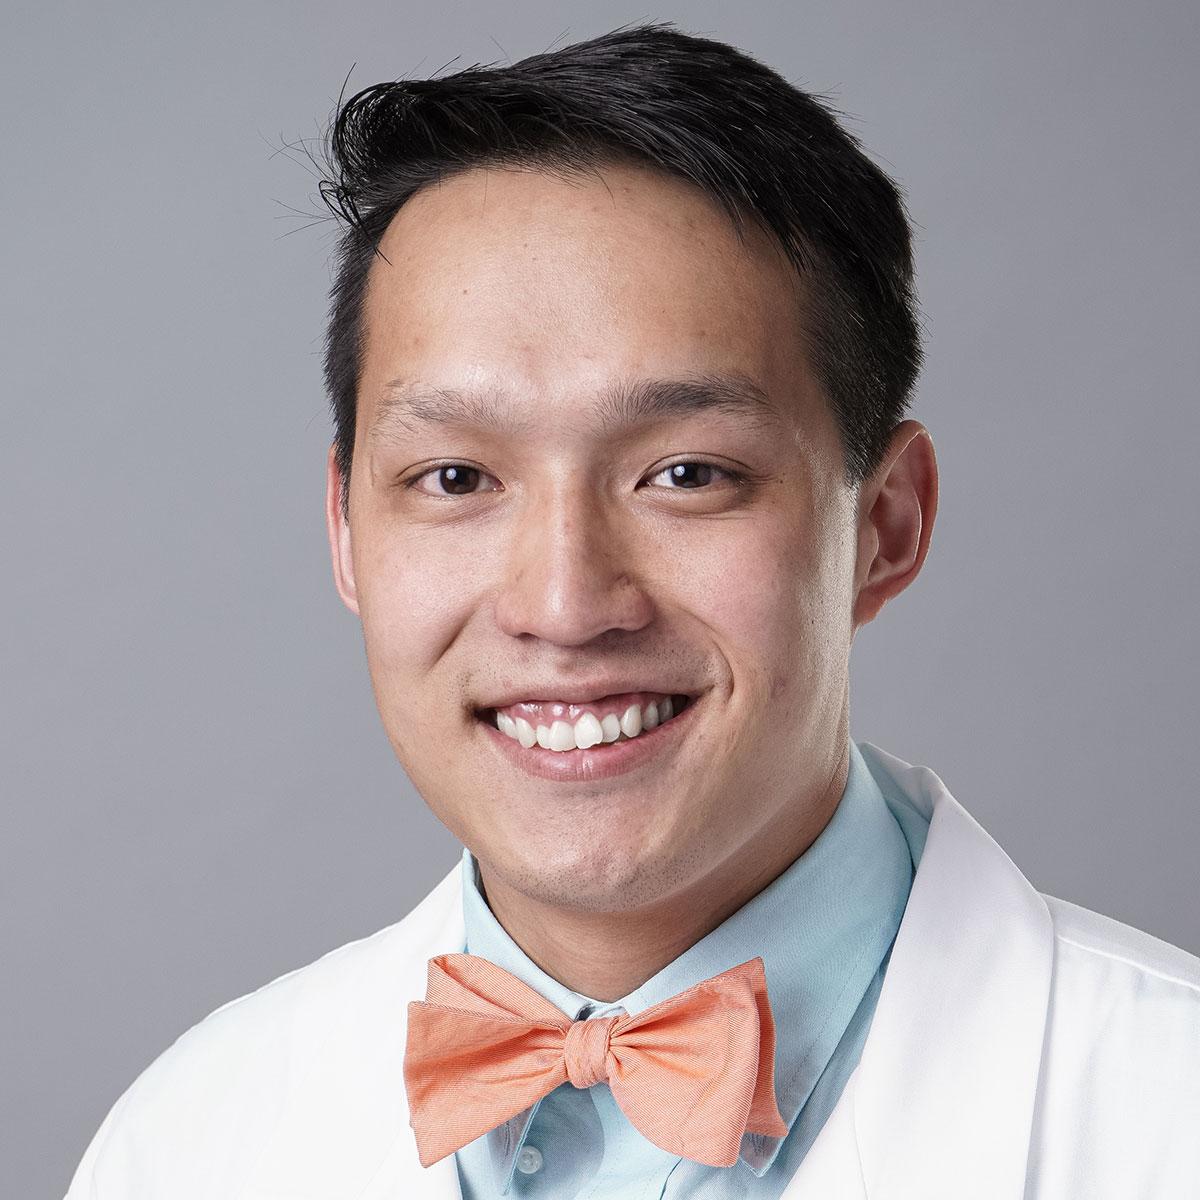 A friendly headshot of Dr. Tai Do